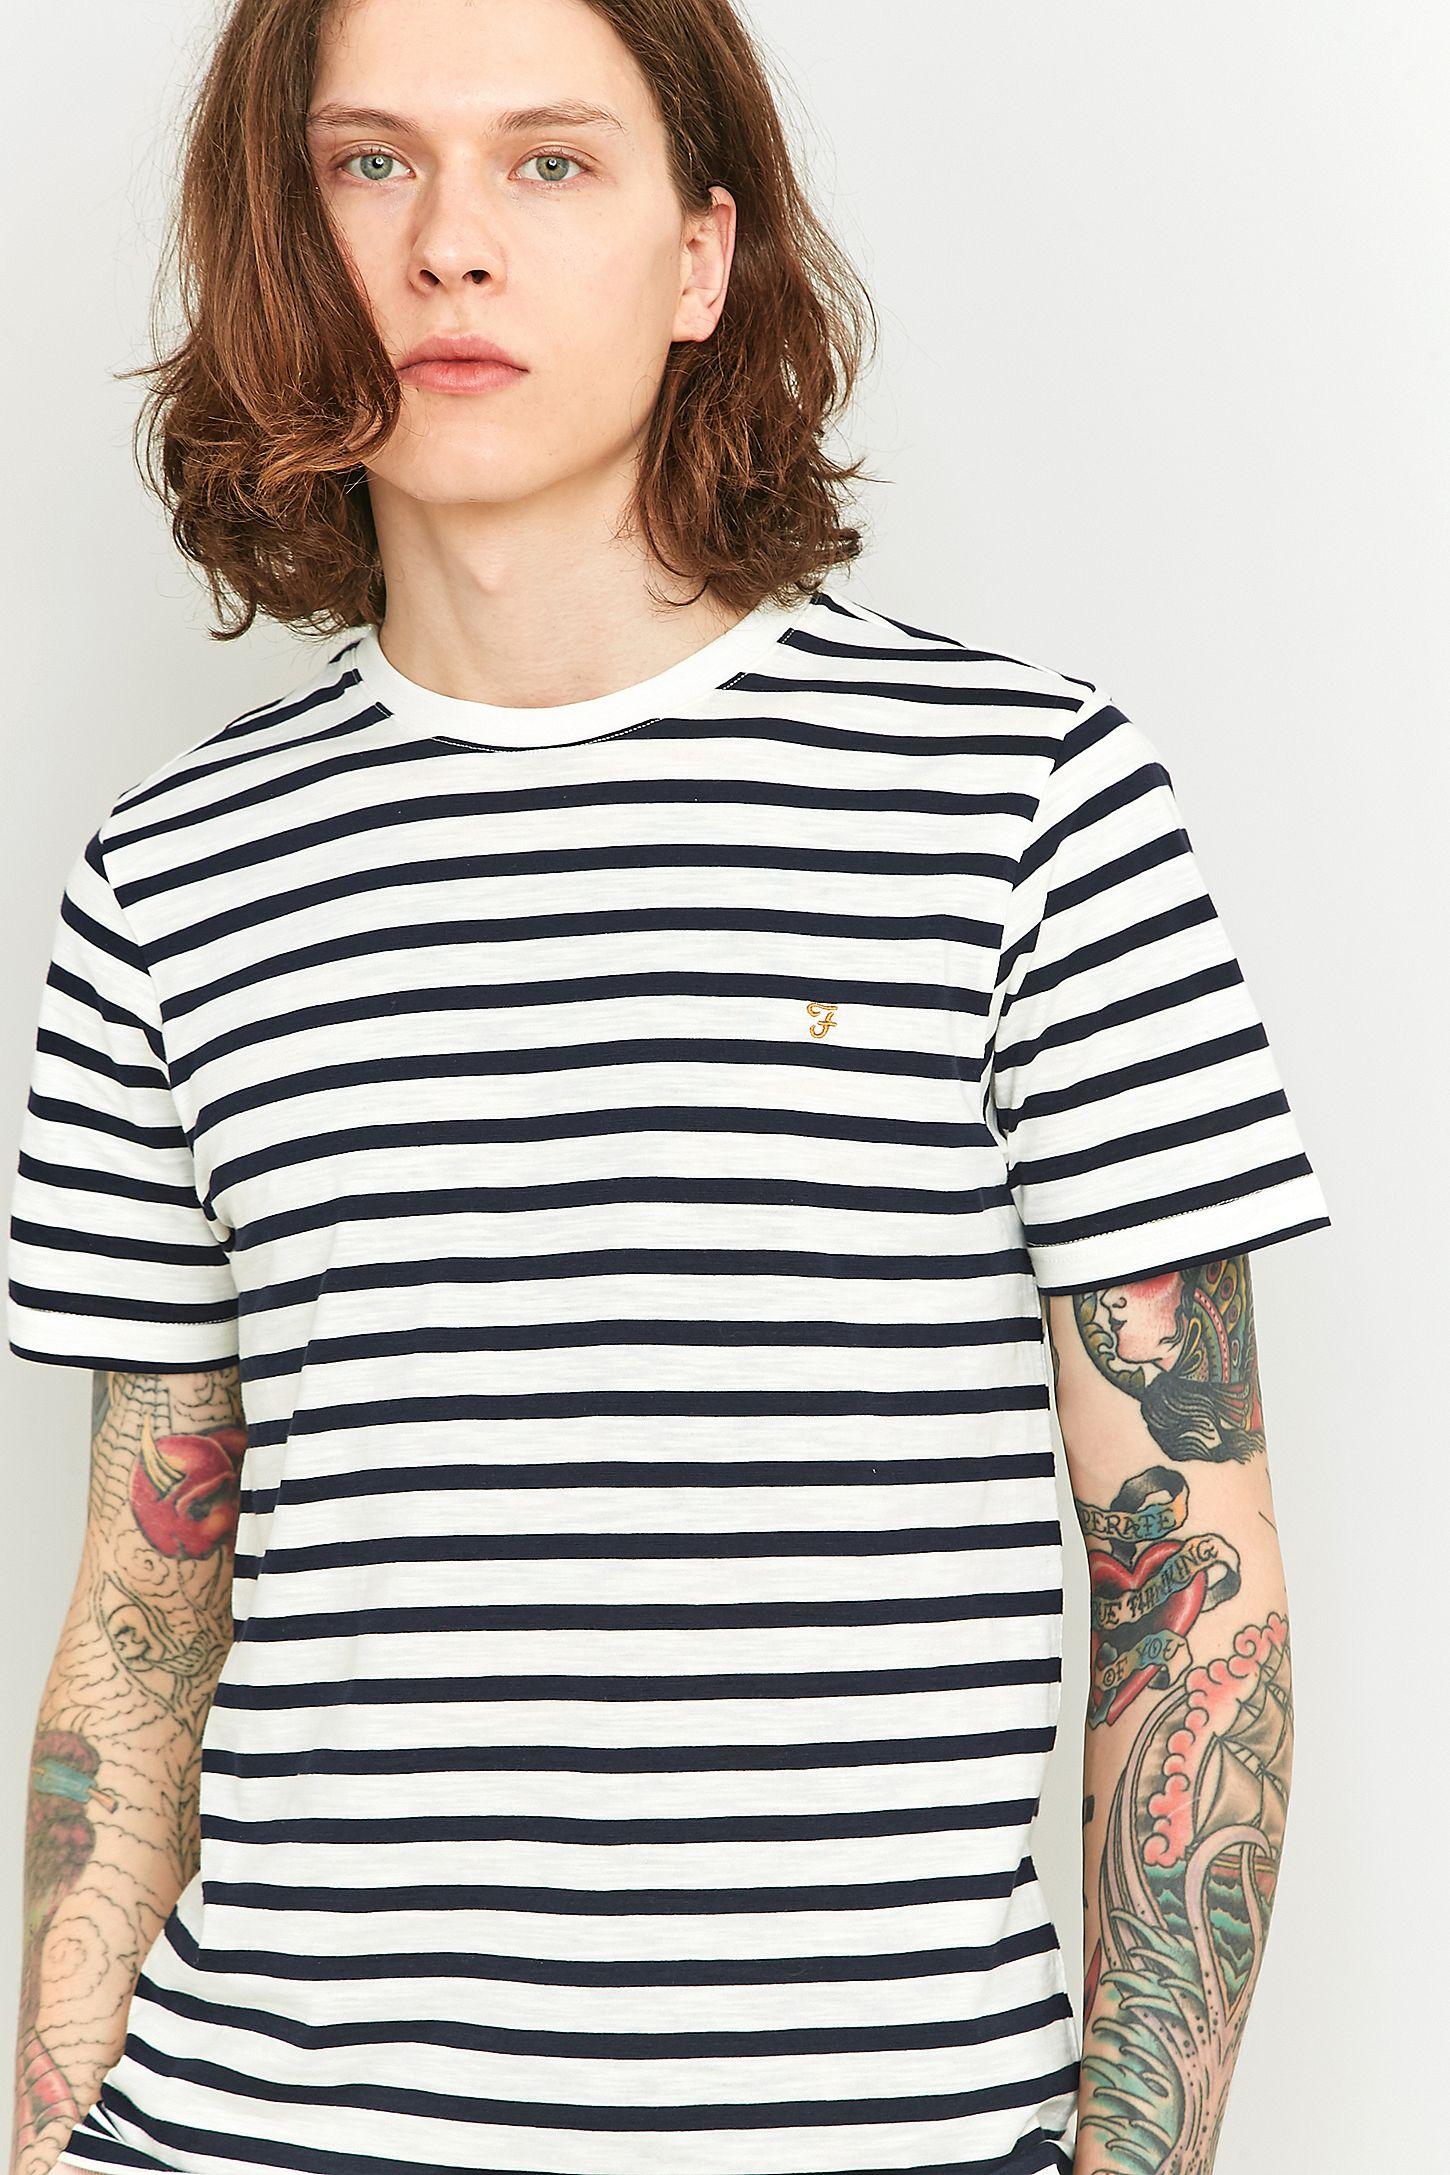 454db09d9a Farah Lennox Navy Striped Short Sleeve T-shirt | Urban Outfitters UK